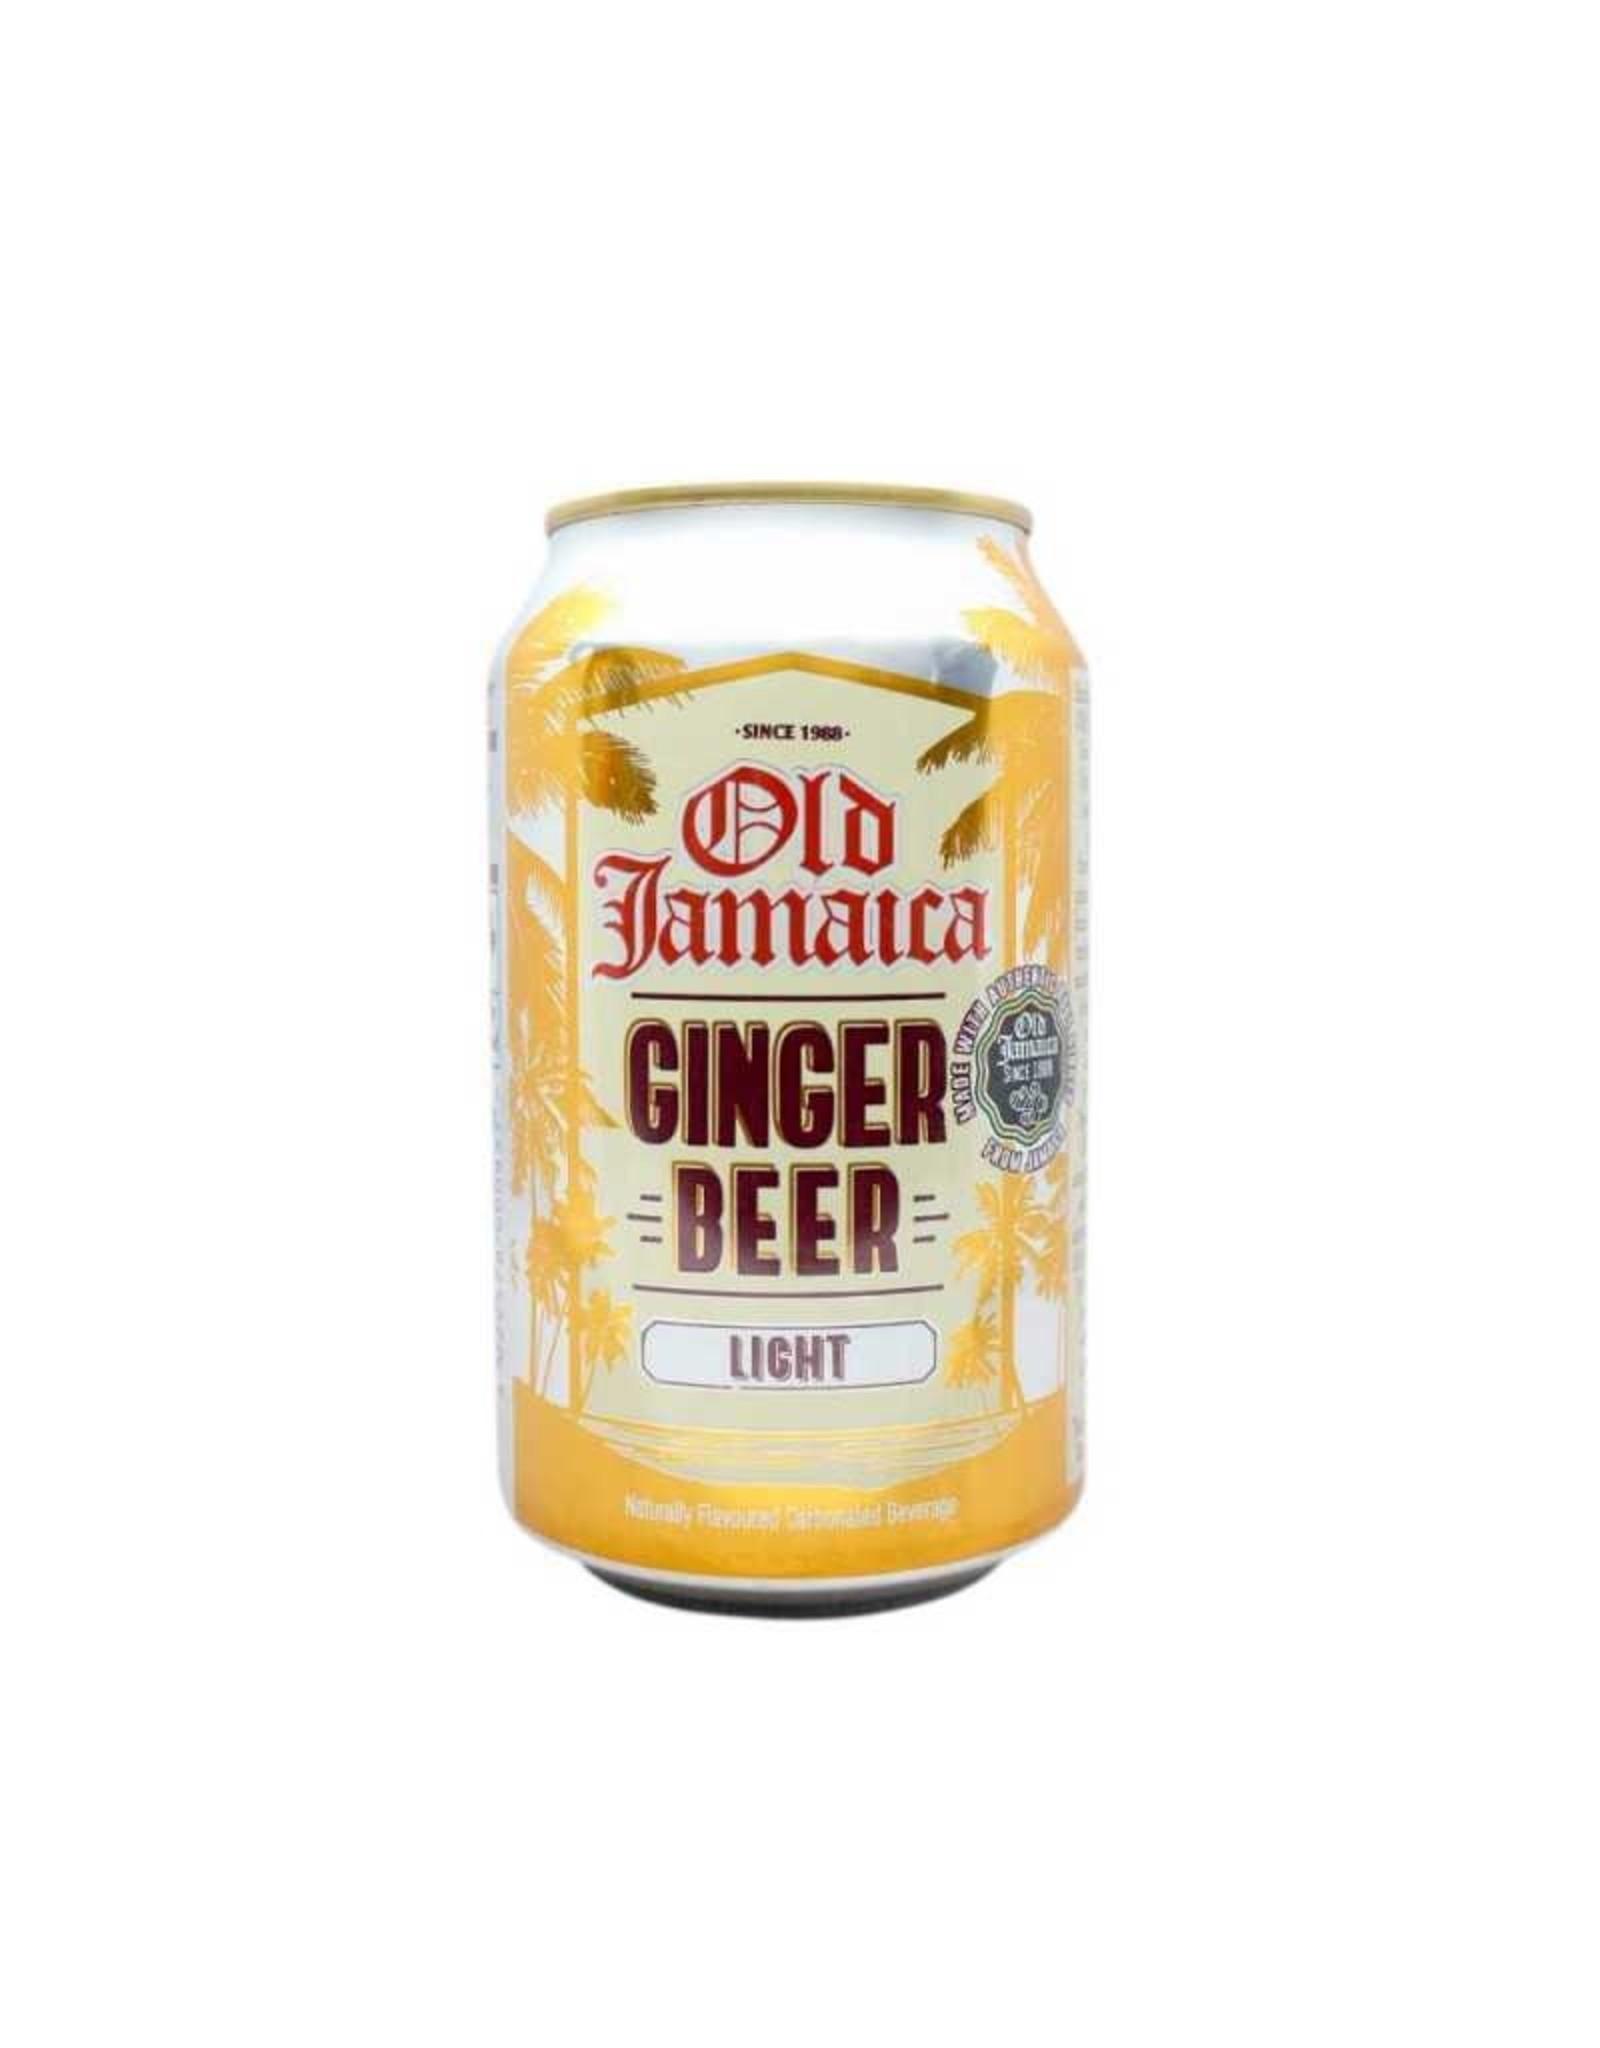 Monster Energy Company OLD JAMAICA Ginger Beer - Light